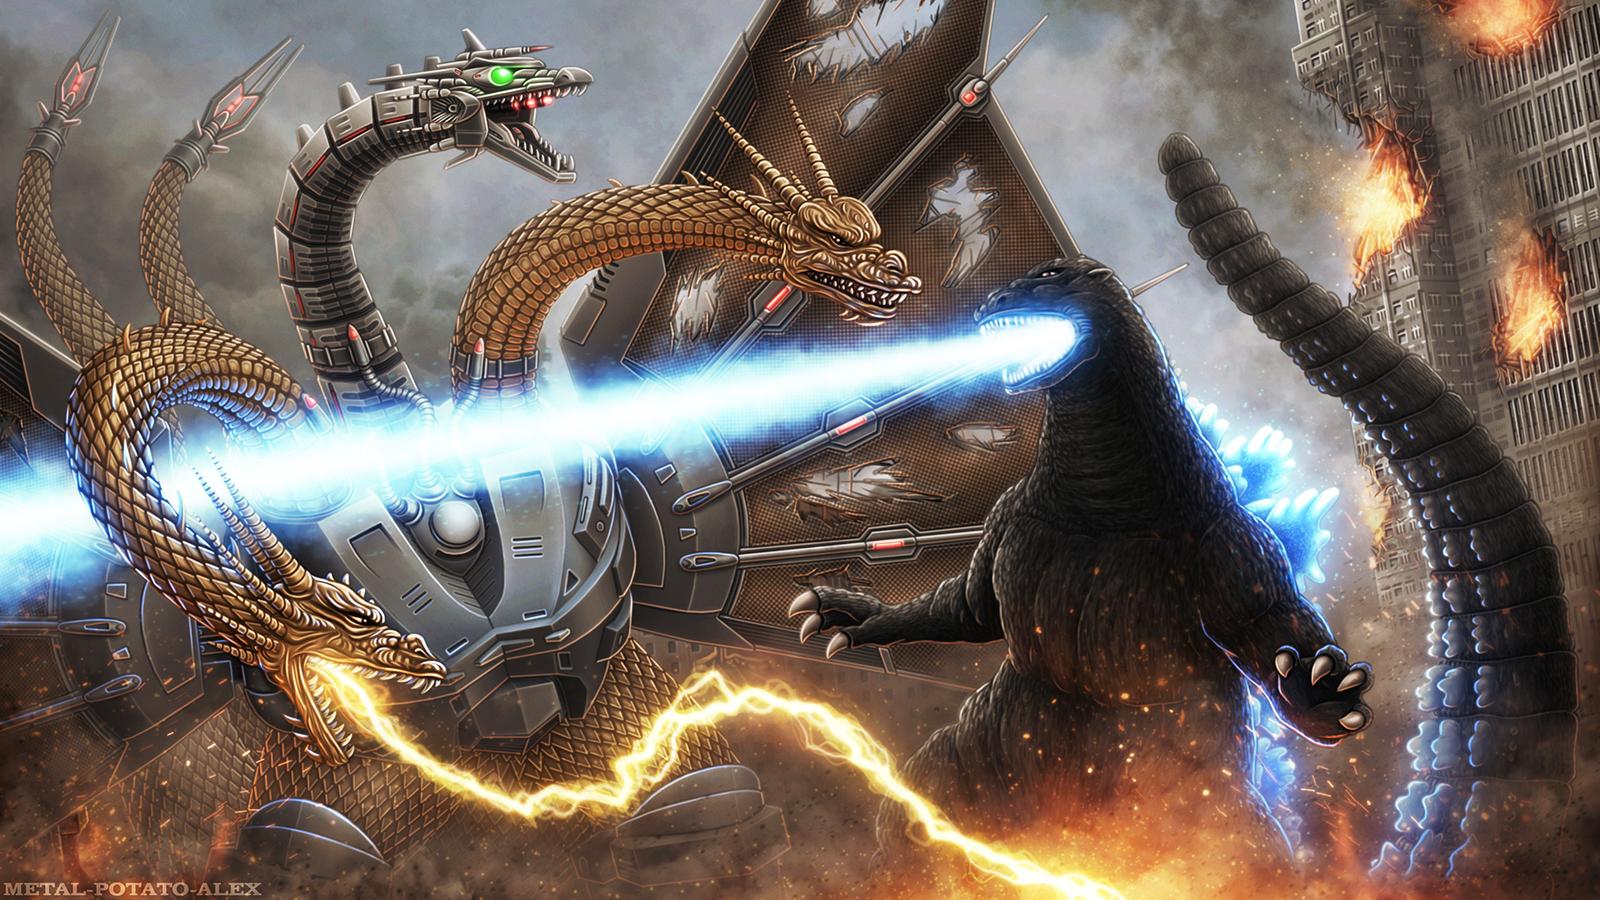 Godzilla - 'Rematch' by OrbitalWings